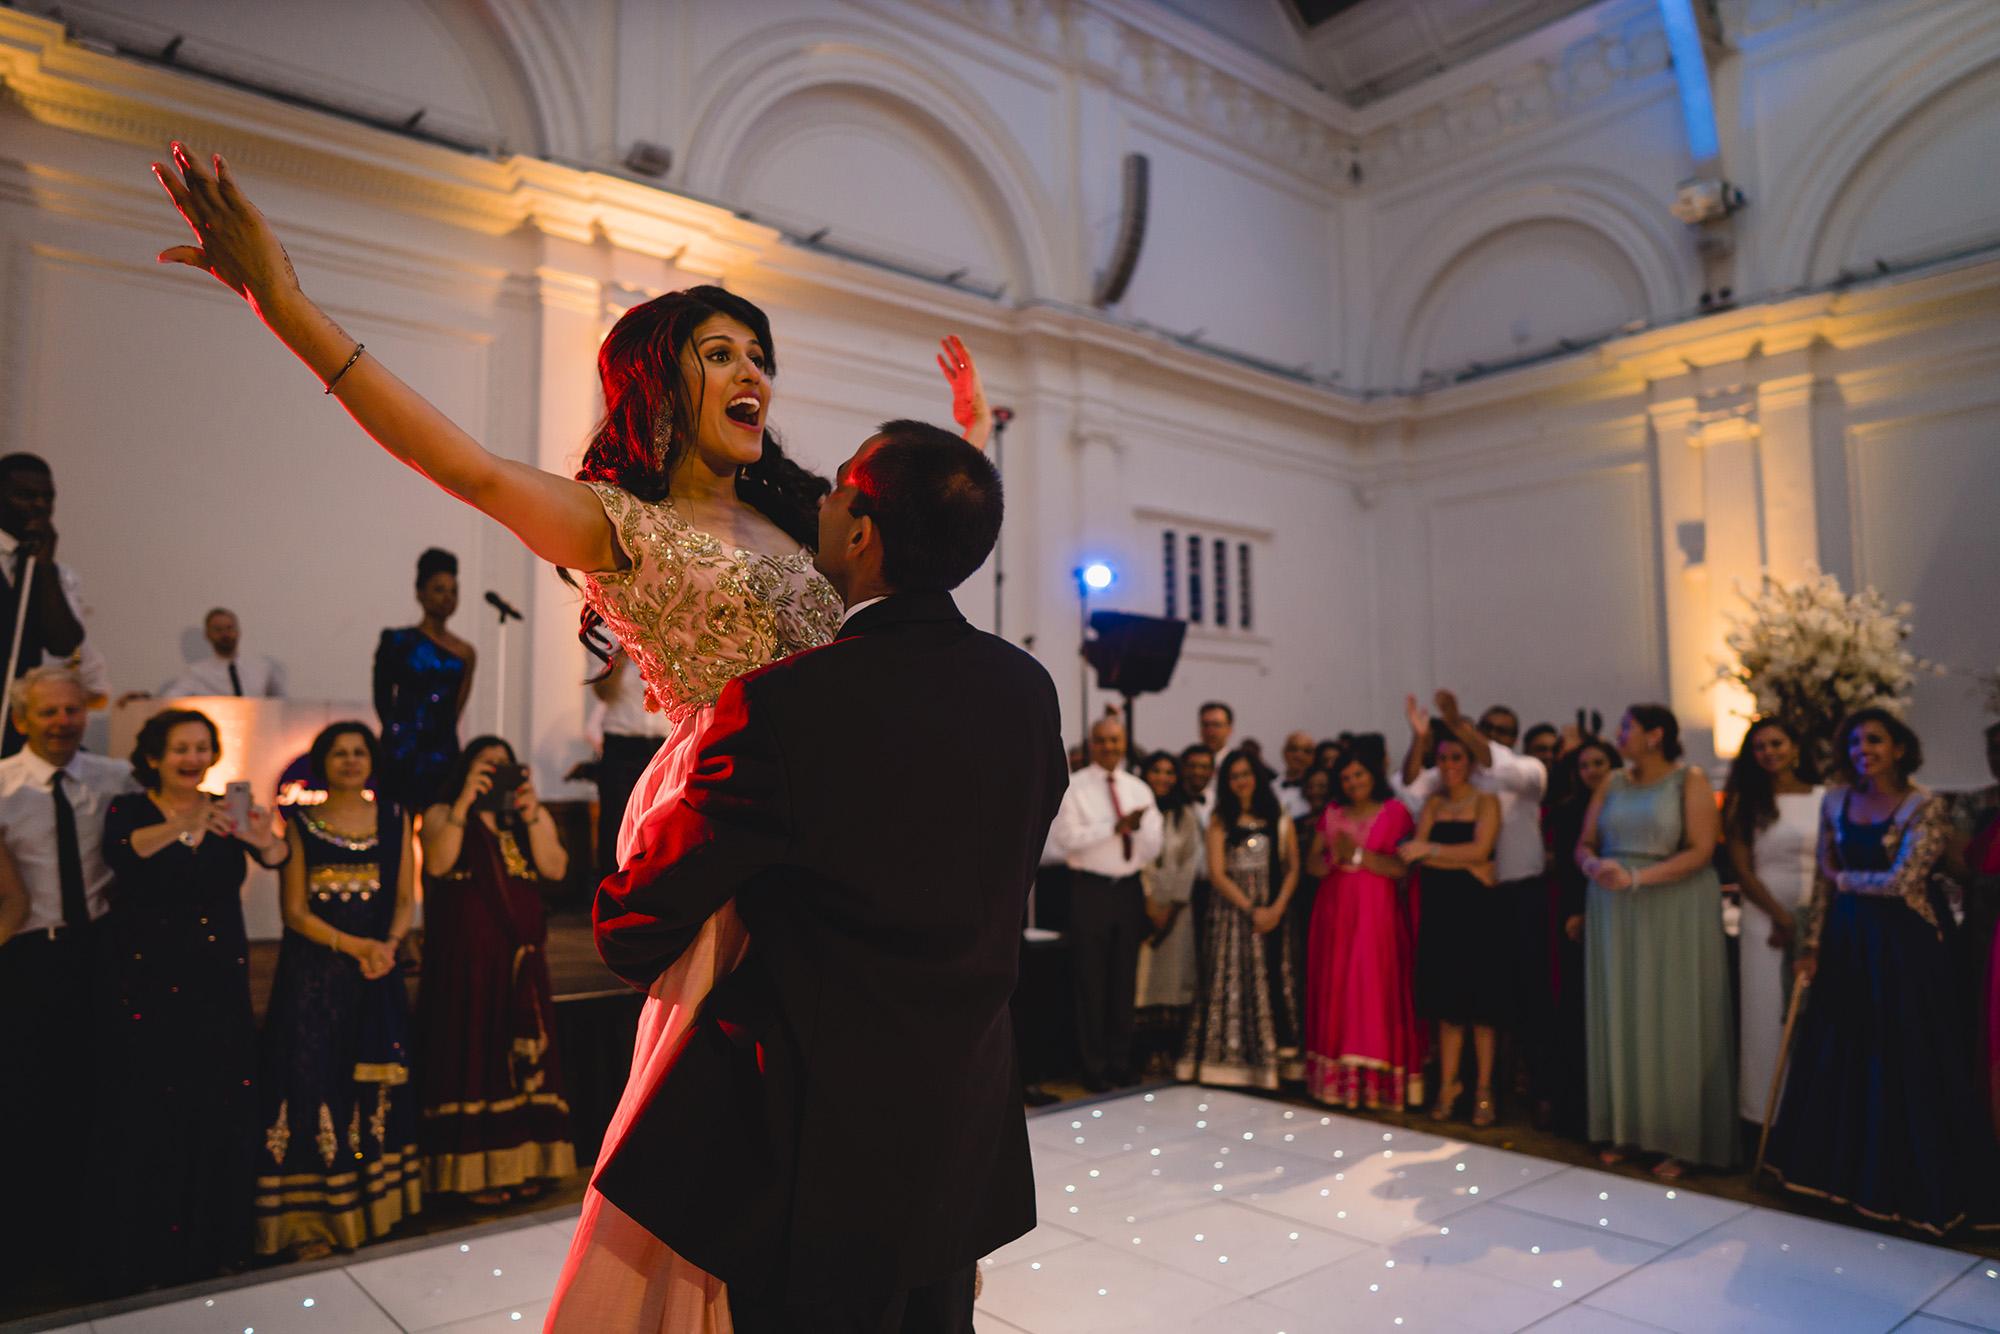 bride lifted by groom on dancefloor